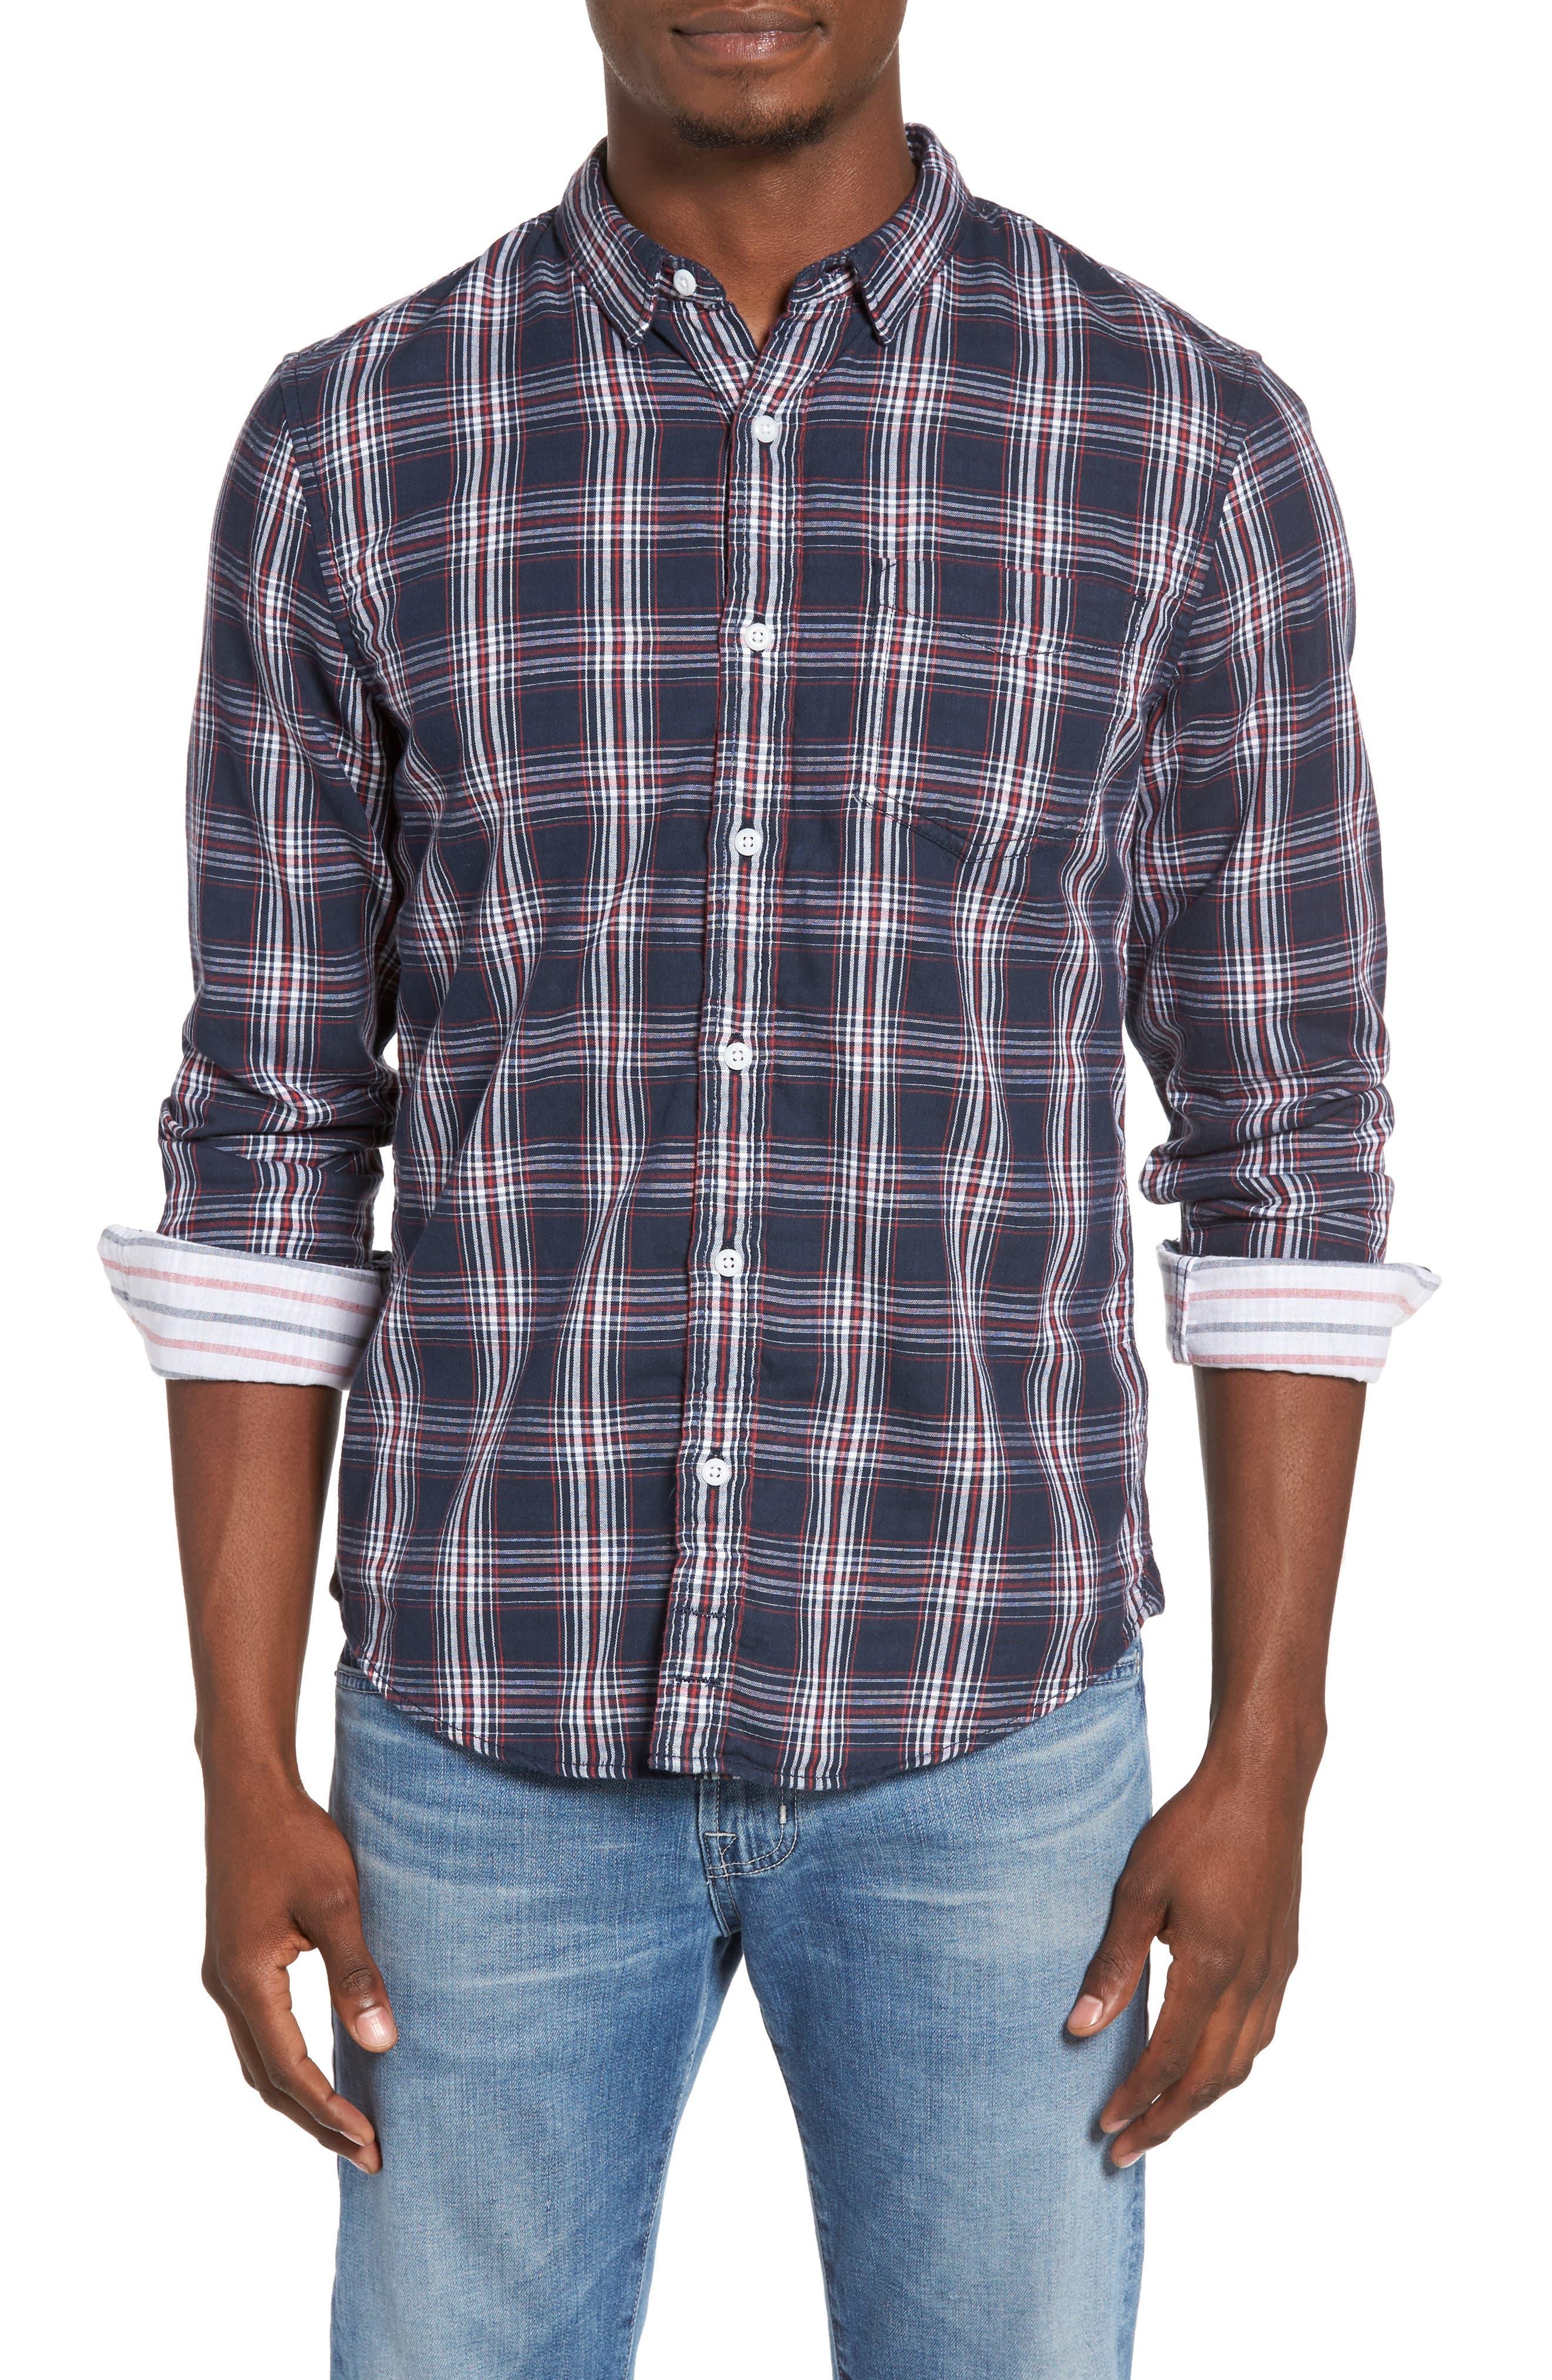 1901 Duofold Plaid Woven Shirt